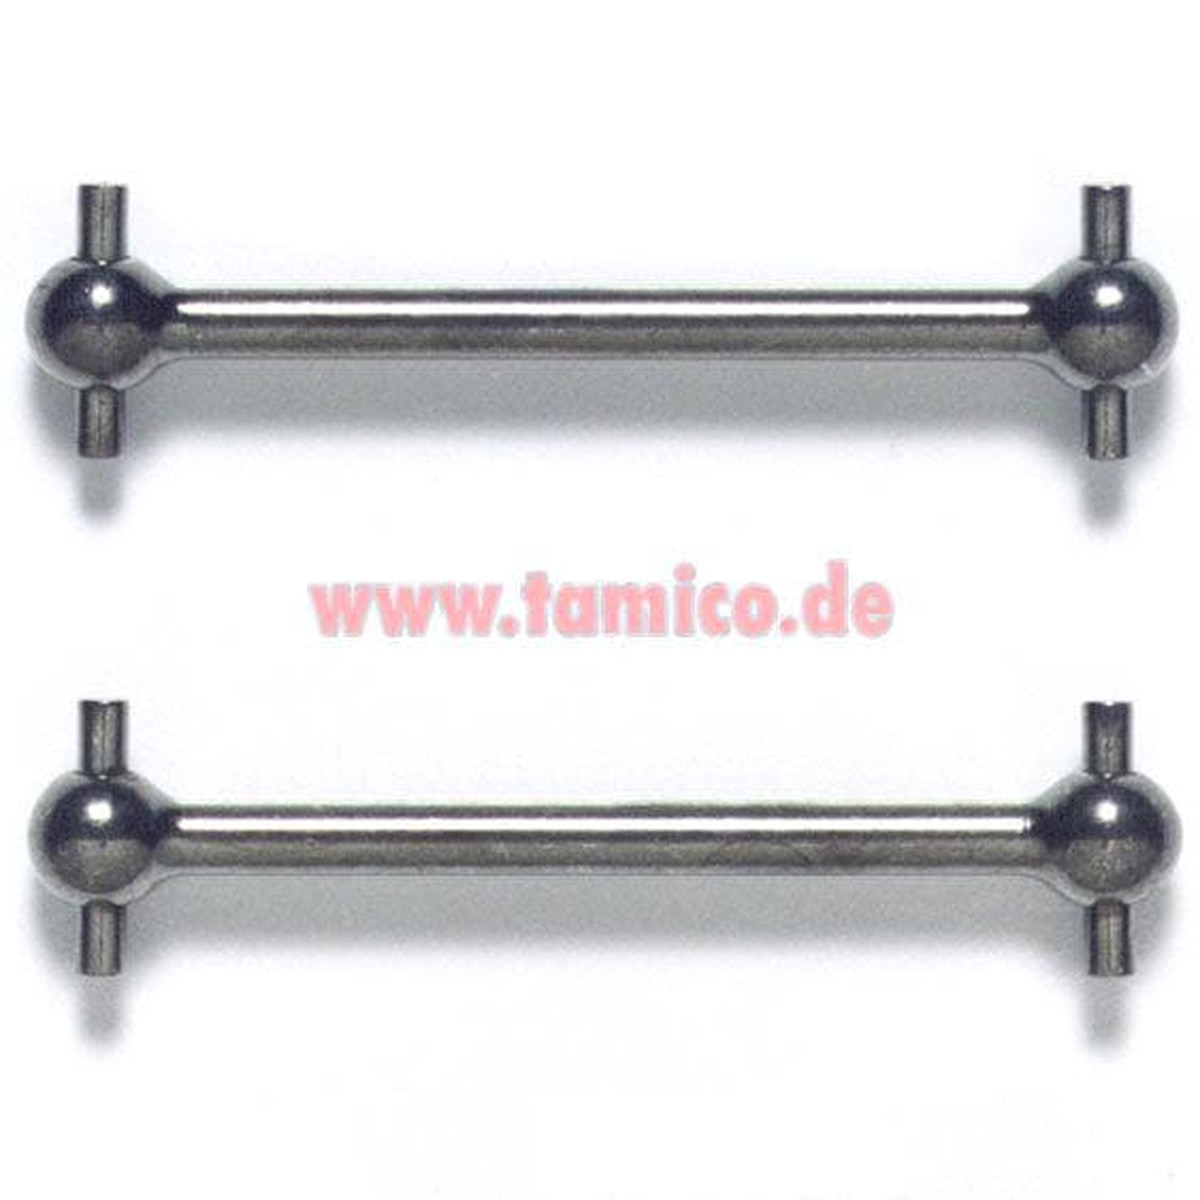 3Racing Rear Aluminum Hub Carrier 2 Degree For Tamiya M05 RC Cars #M05-30//2//LB